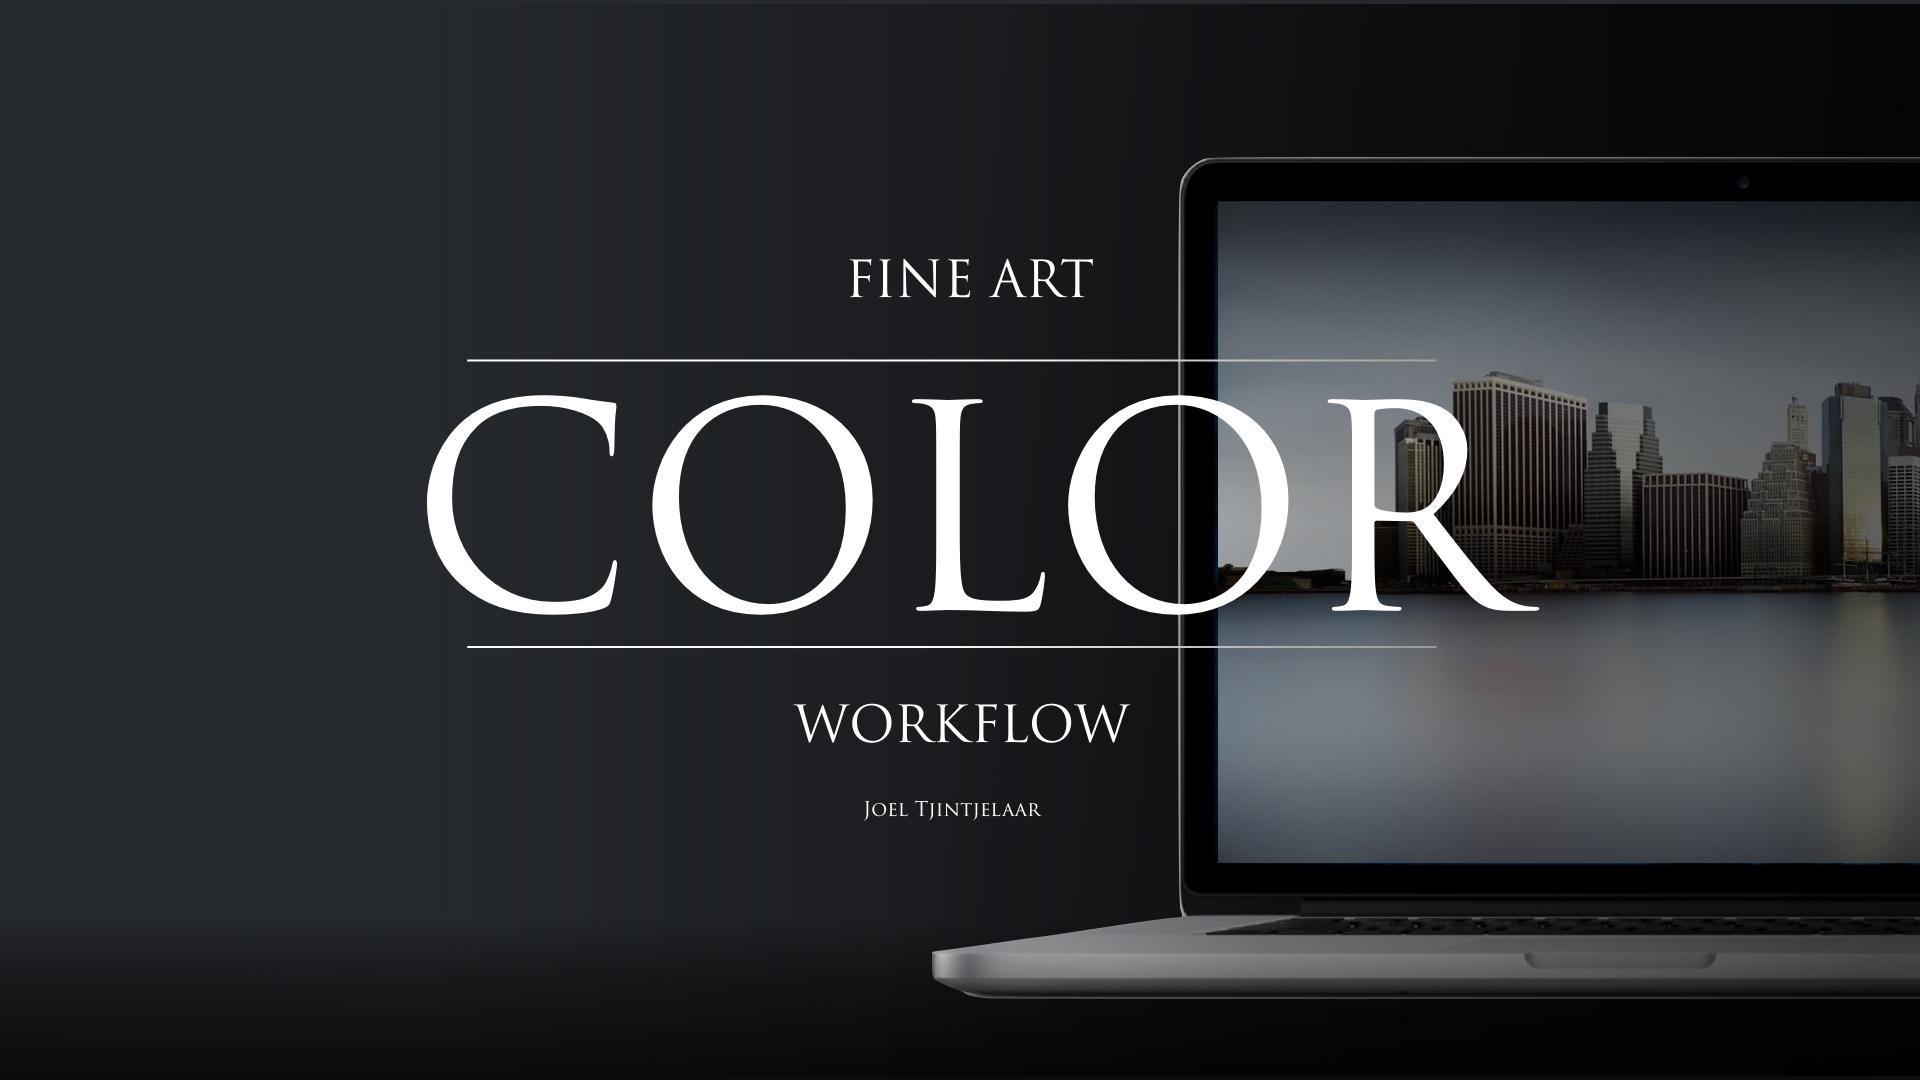 Fine Art Color Workflow - Joel Tjintjelaar